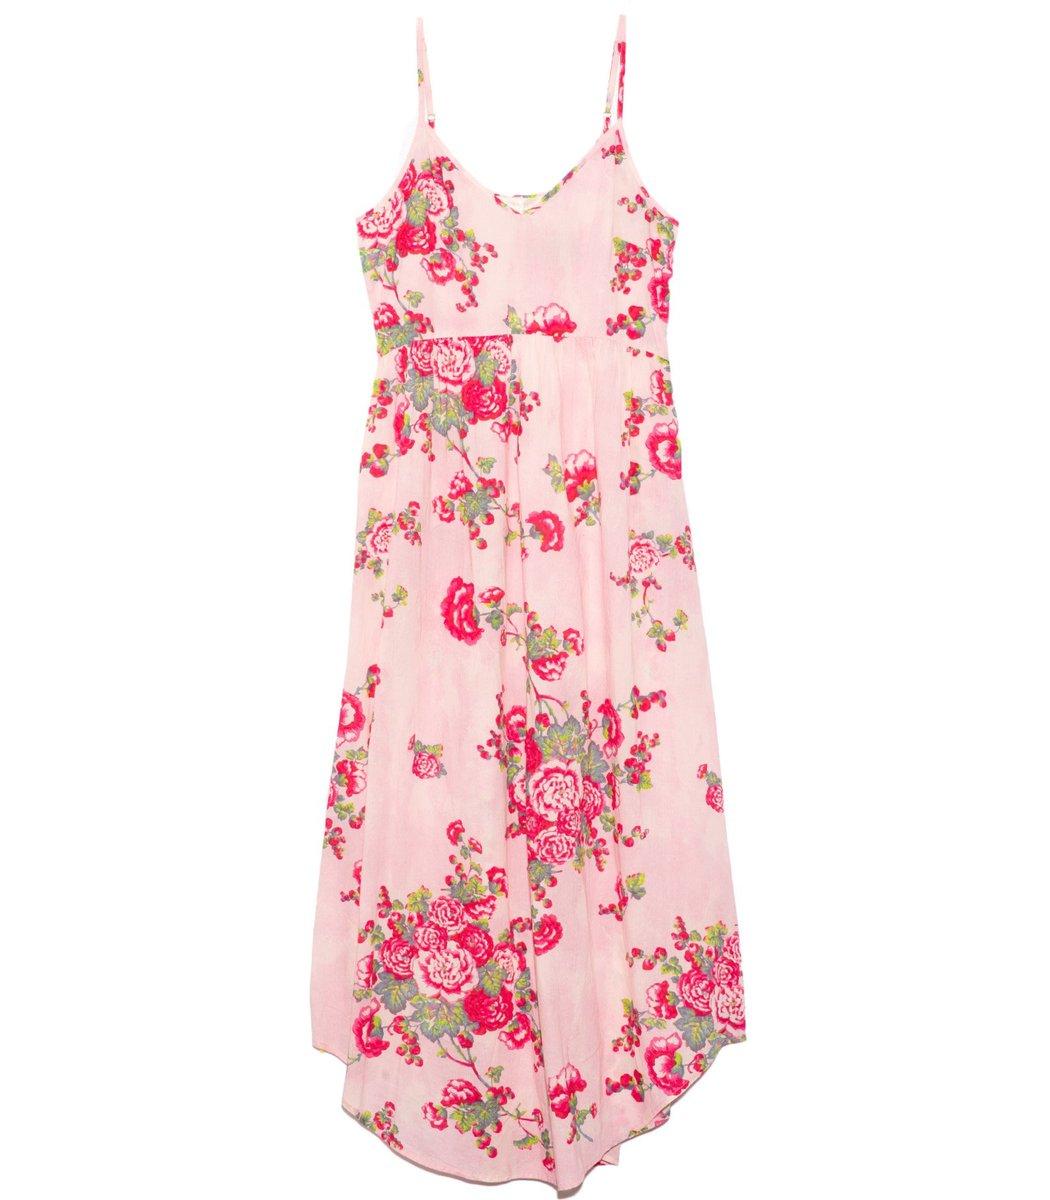 Loveshackfancy Faraday Slip Dress in Pink Desert